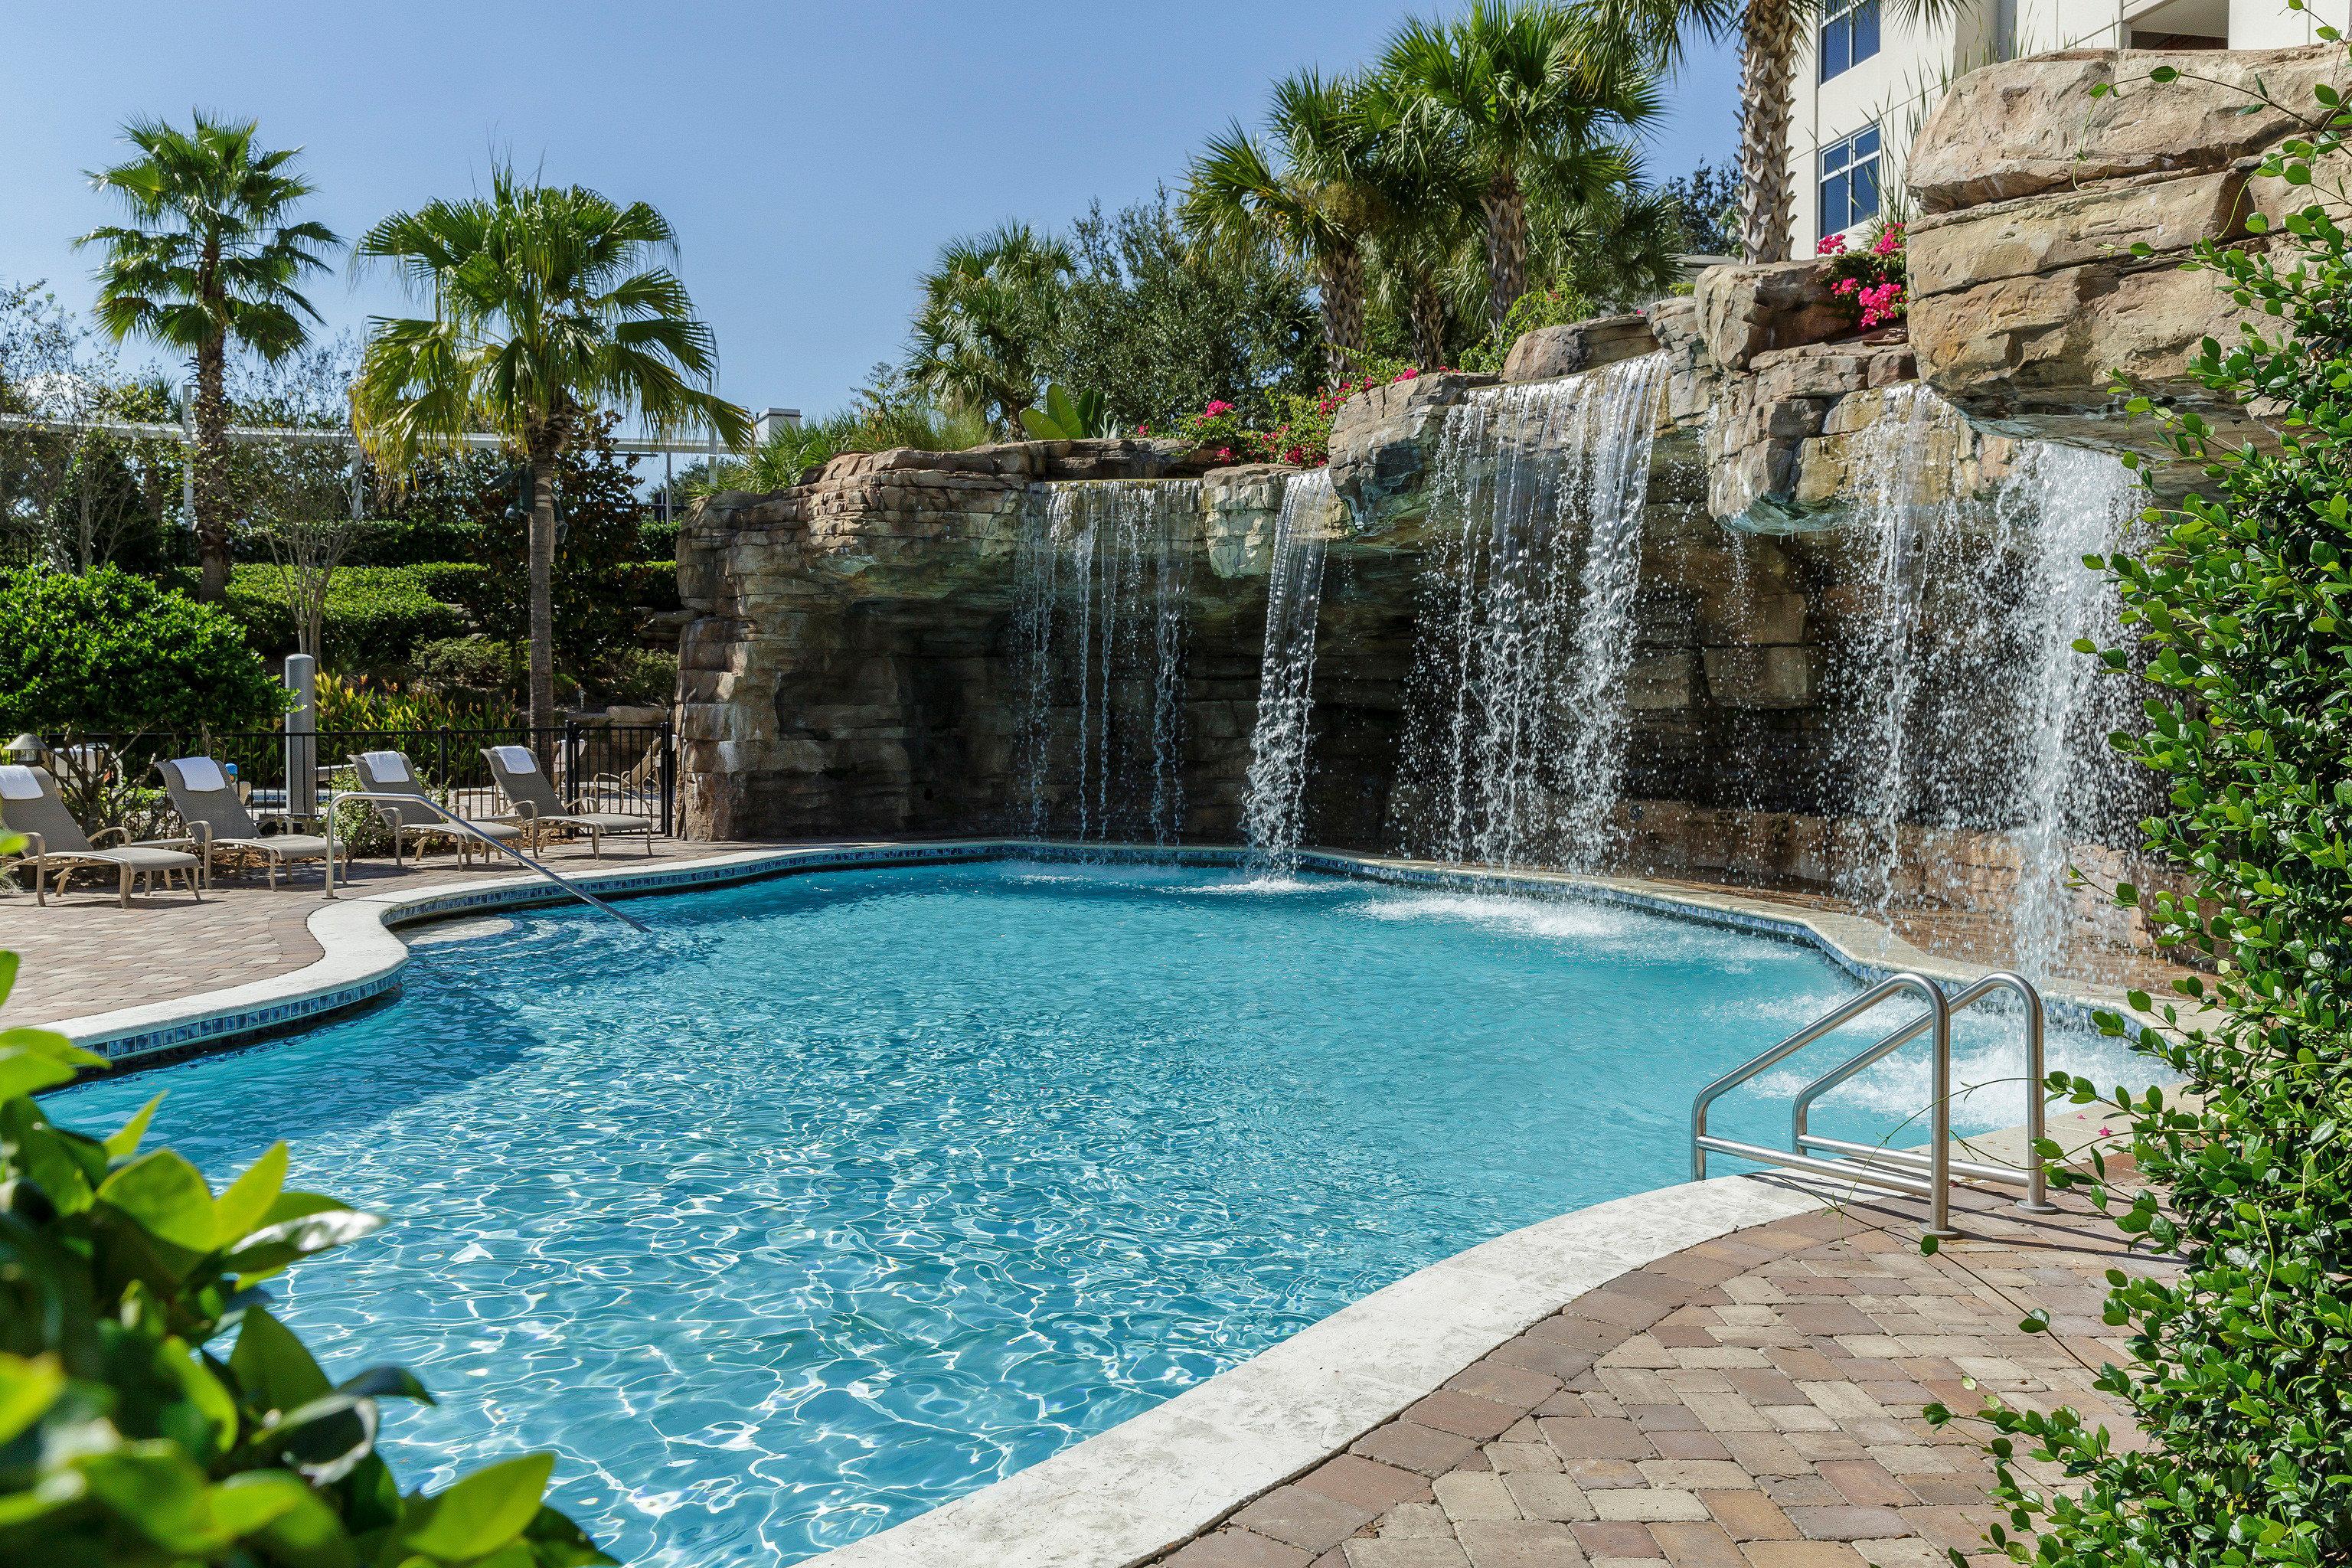 All-inclusive Lounge Play Pool Waterfall tree sky swimming pool property reflecting pool Villa backyard Resort water feature stone swimming